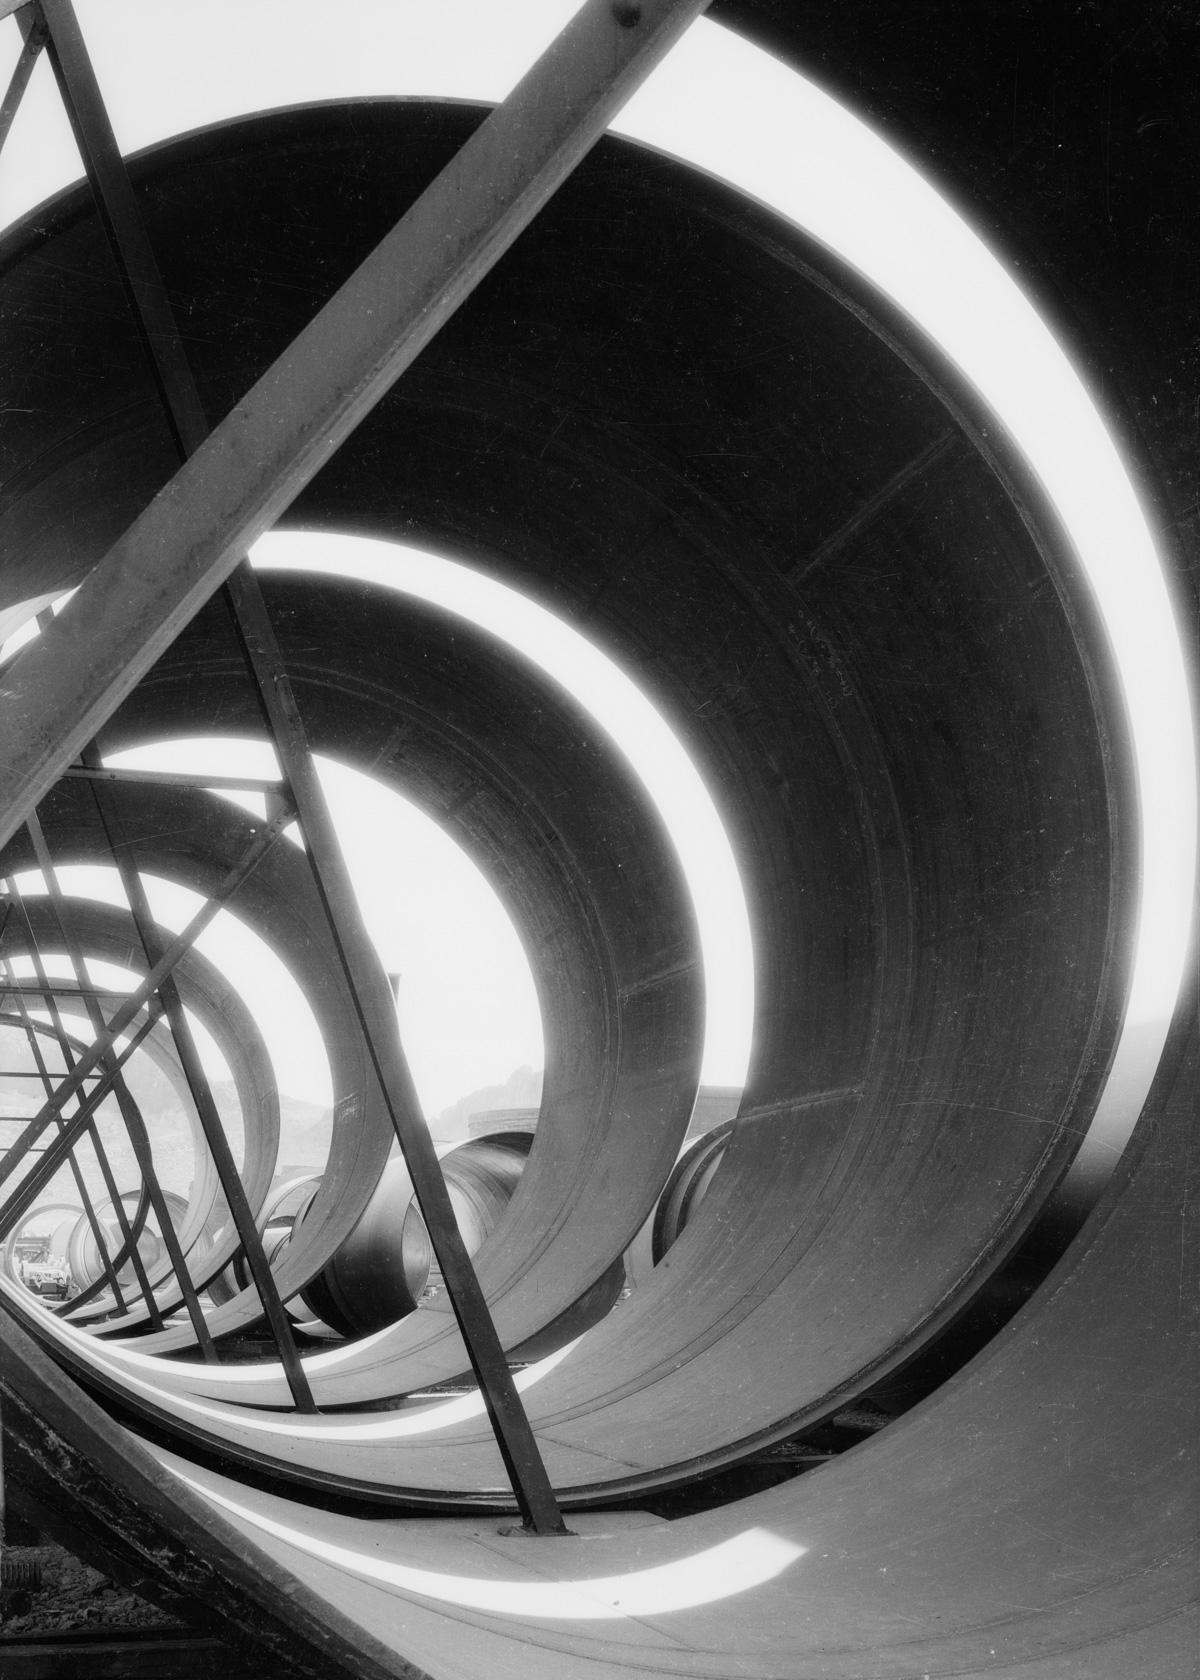 1934 --- dw-1934-412-08-67~06 --- Image by © Dick Whittington Studio/Corbis